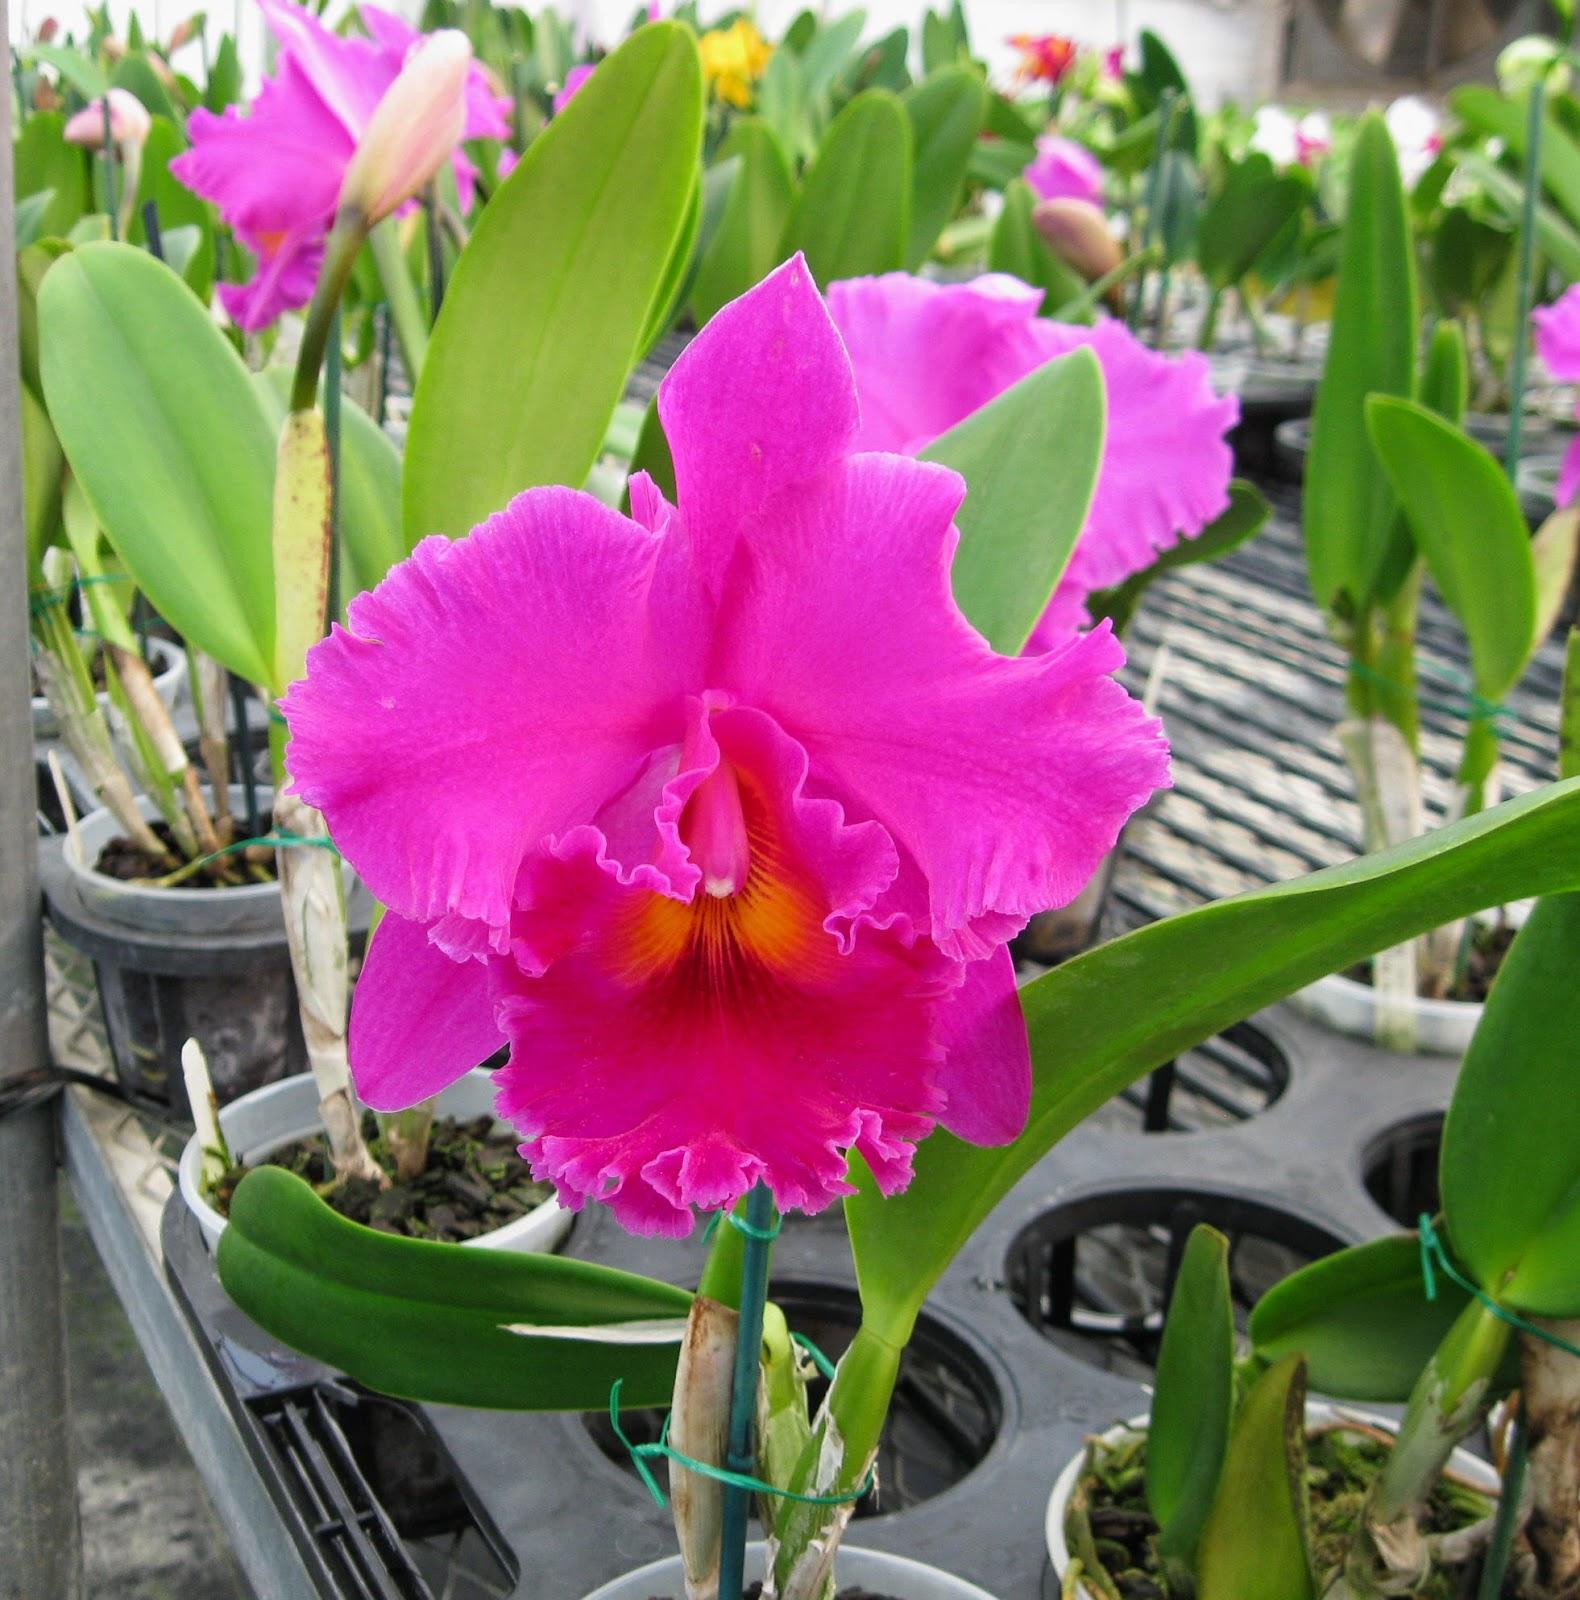 Blc. Cornerstone Yuan Gui orchid flowers